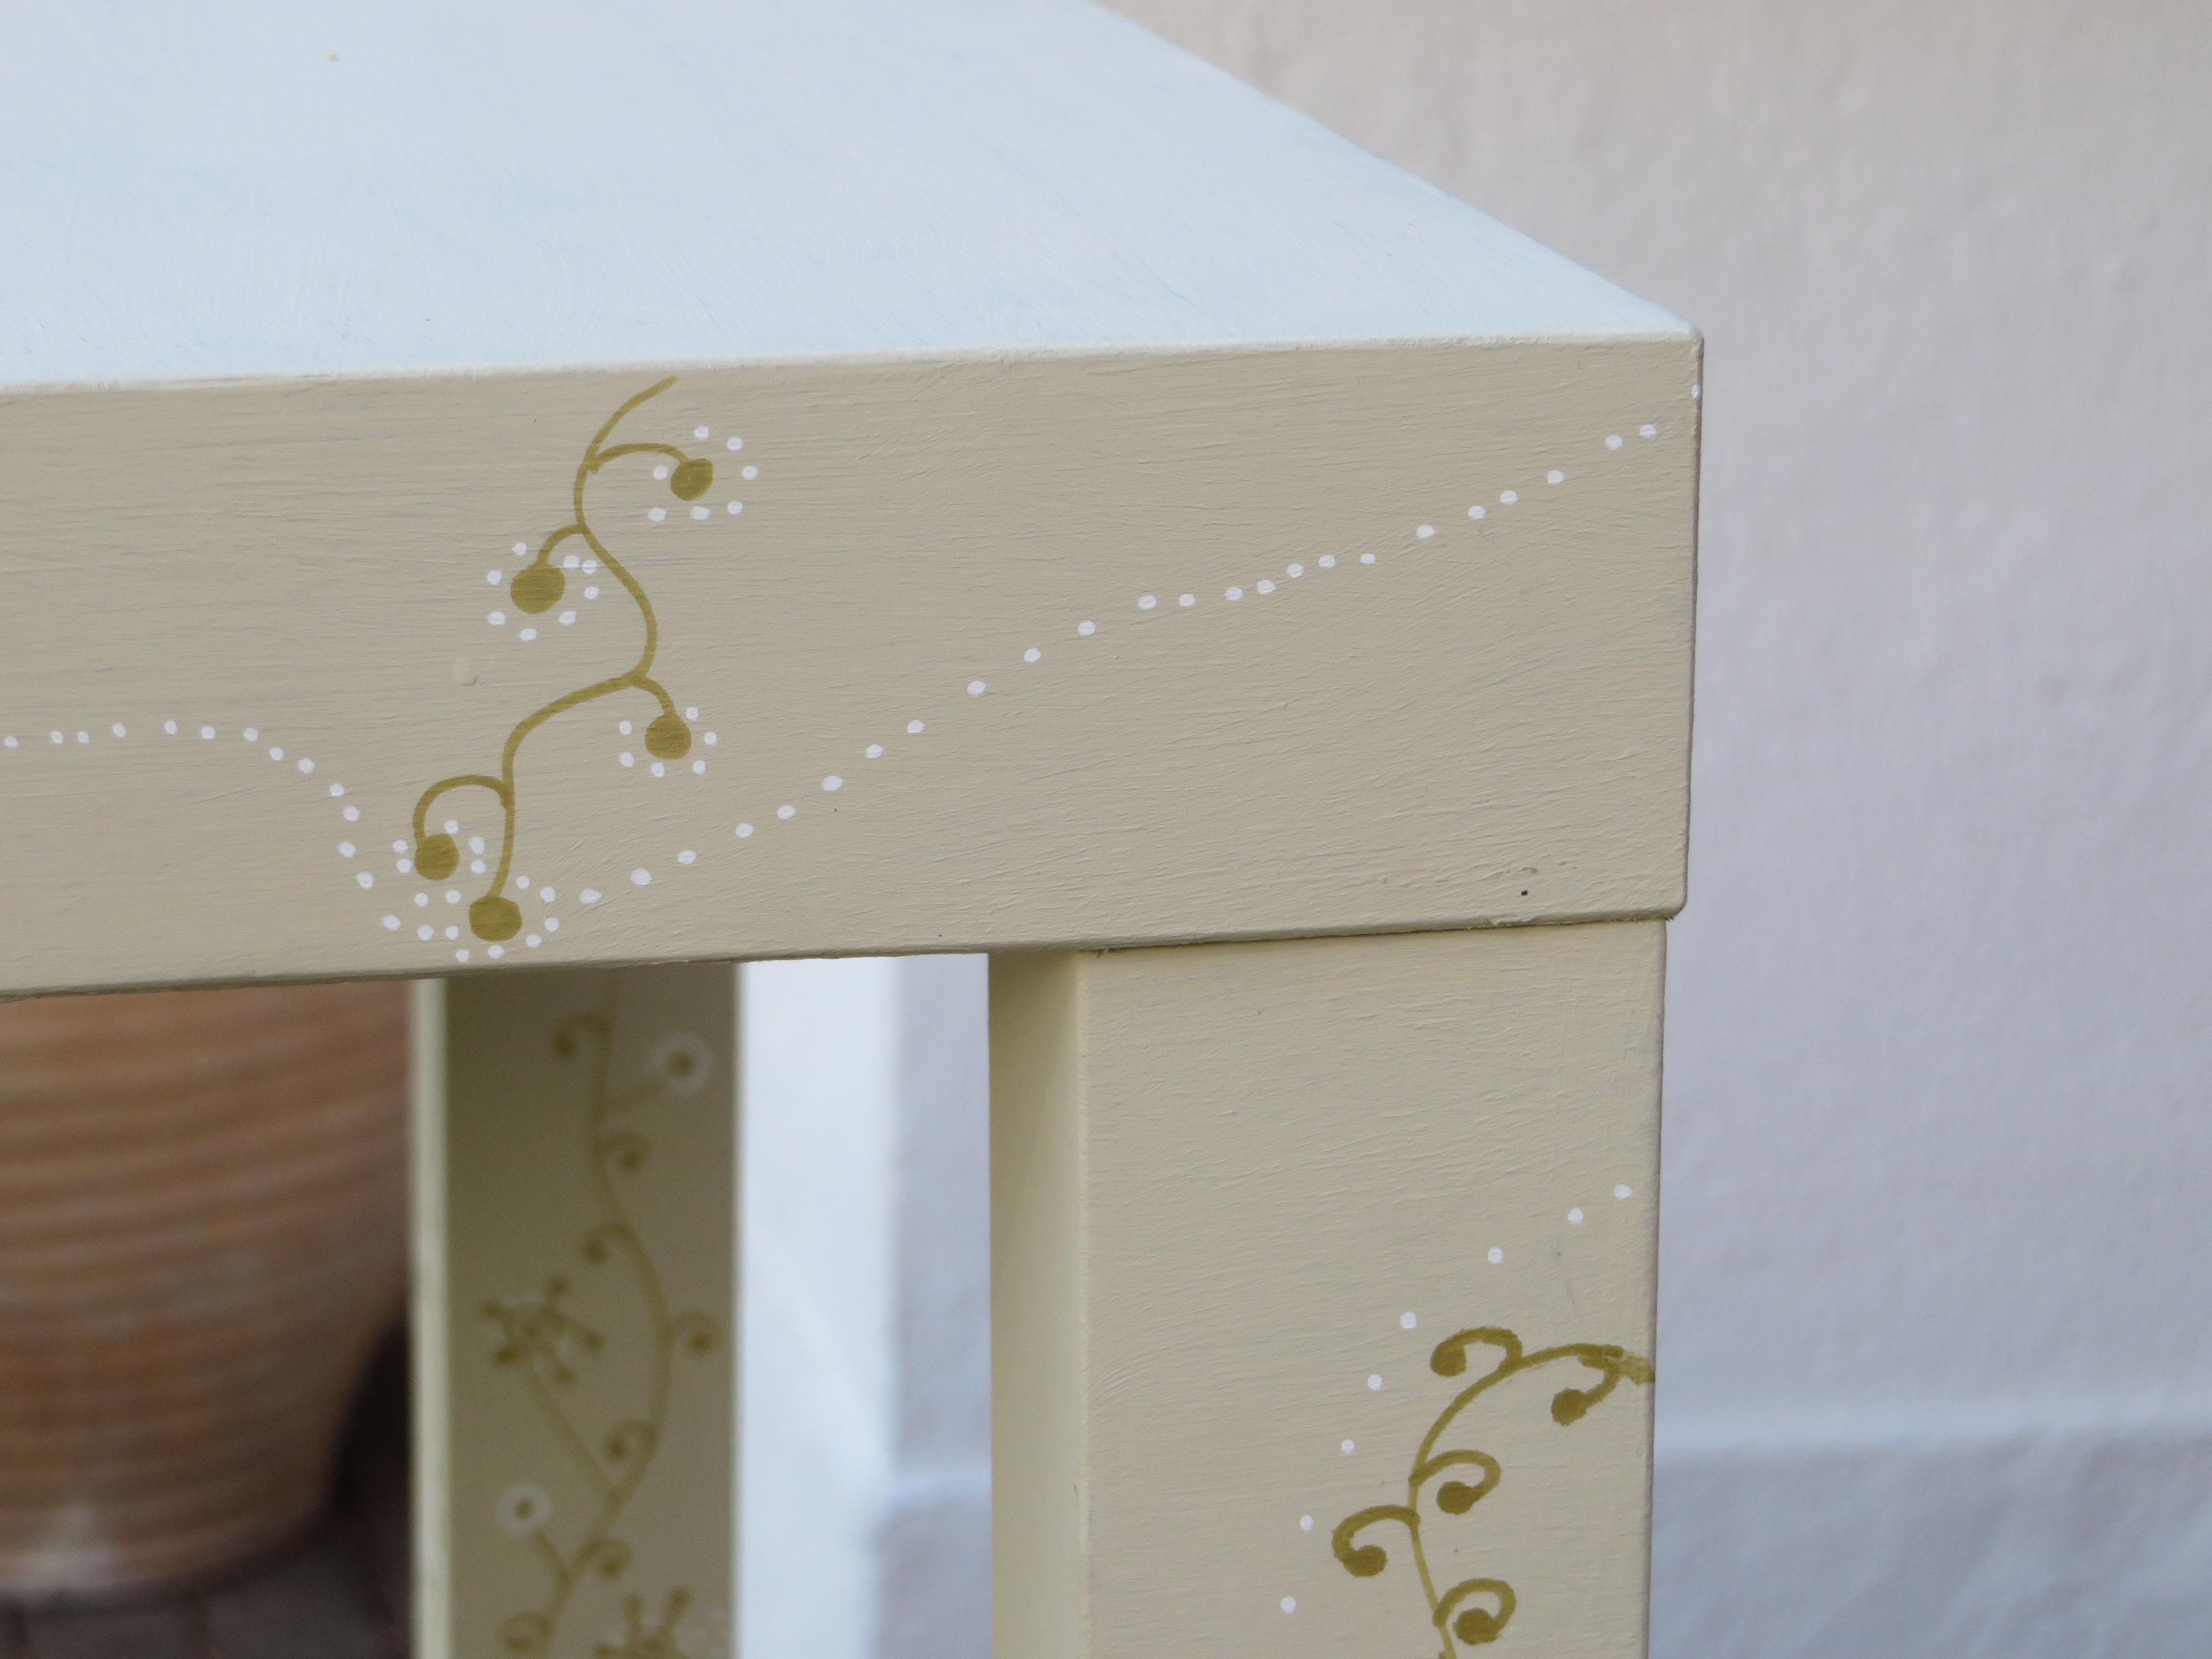 Soy de mesa lack de ikea non perfect el blog imperfecto for Patas para mesas ikea